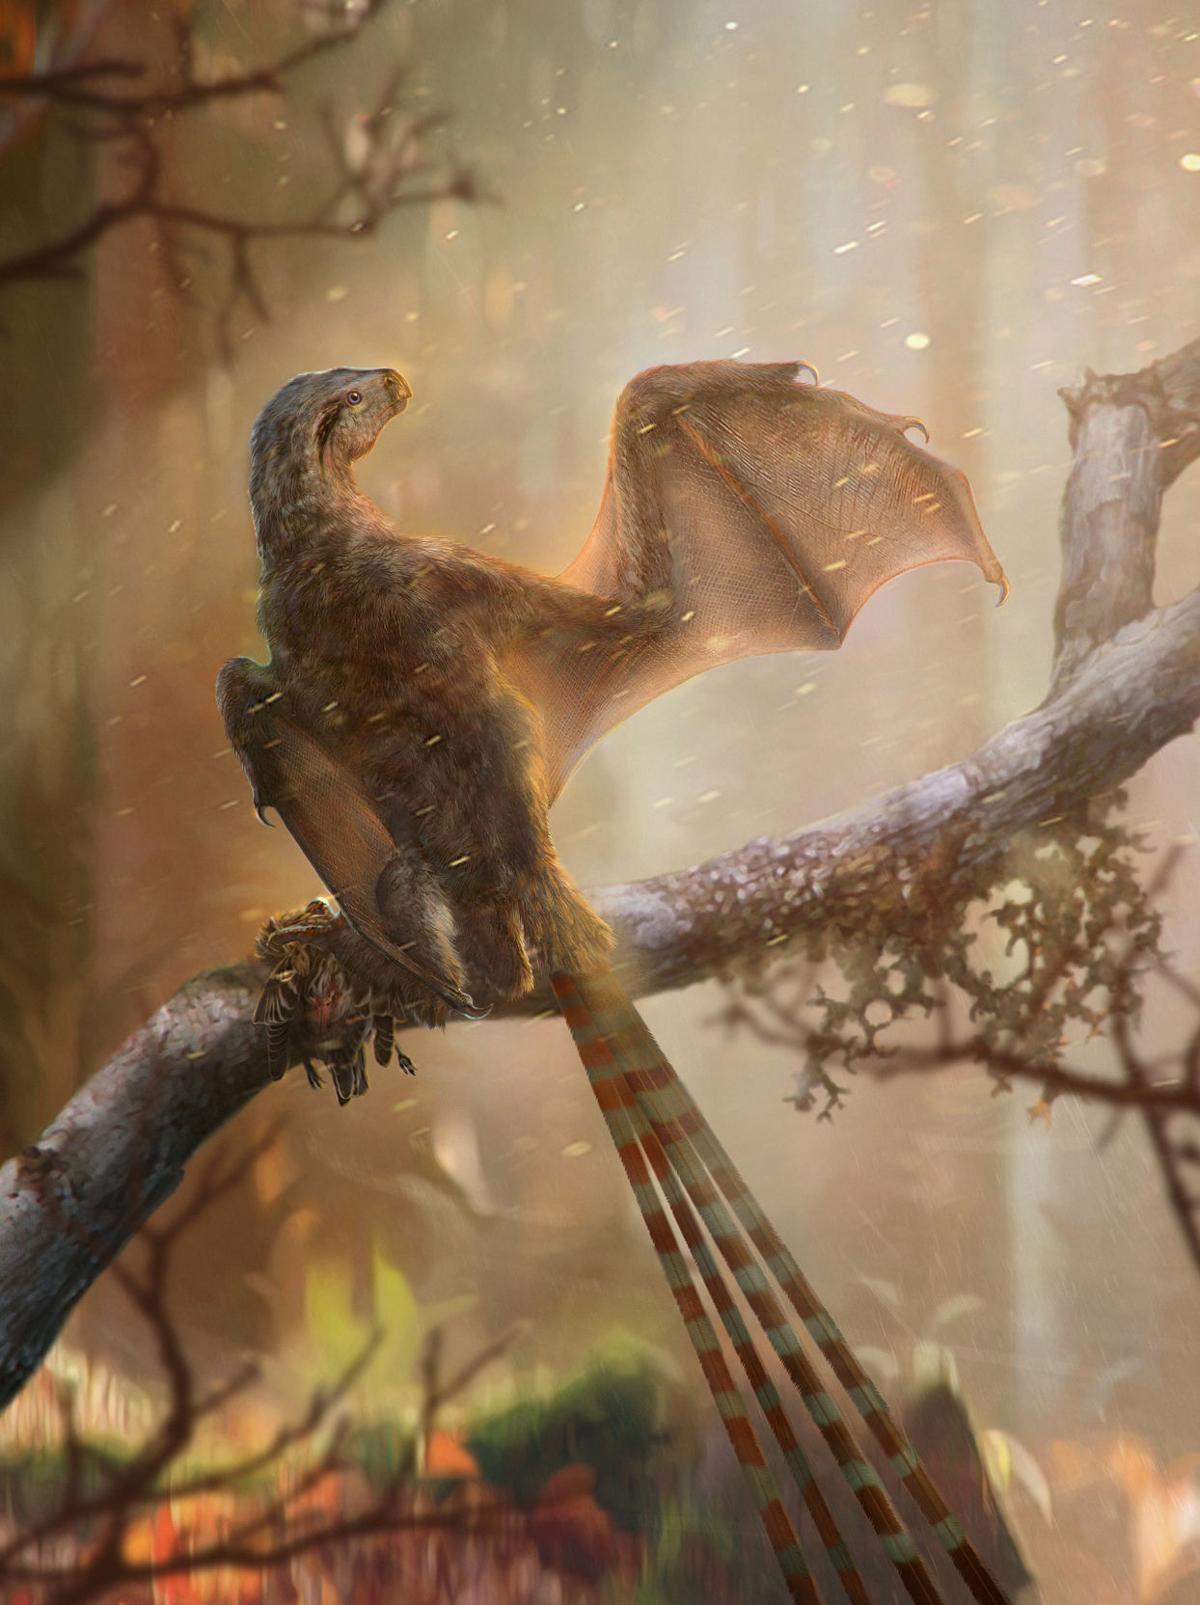 A life reconstruction of a Jurassic Period dinosaur Ambopteryx longibrachium